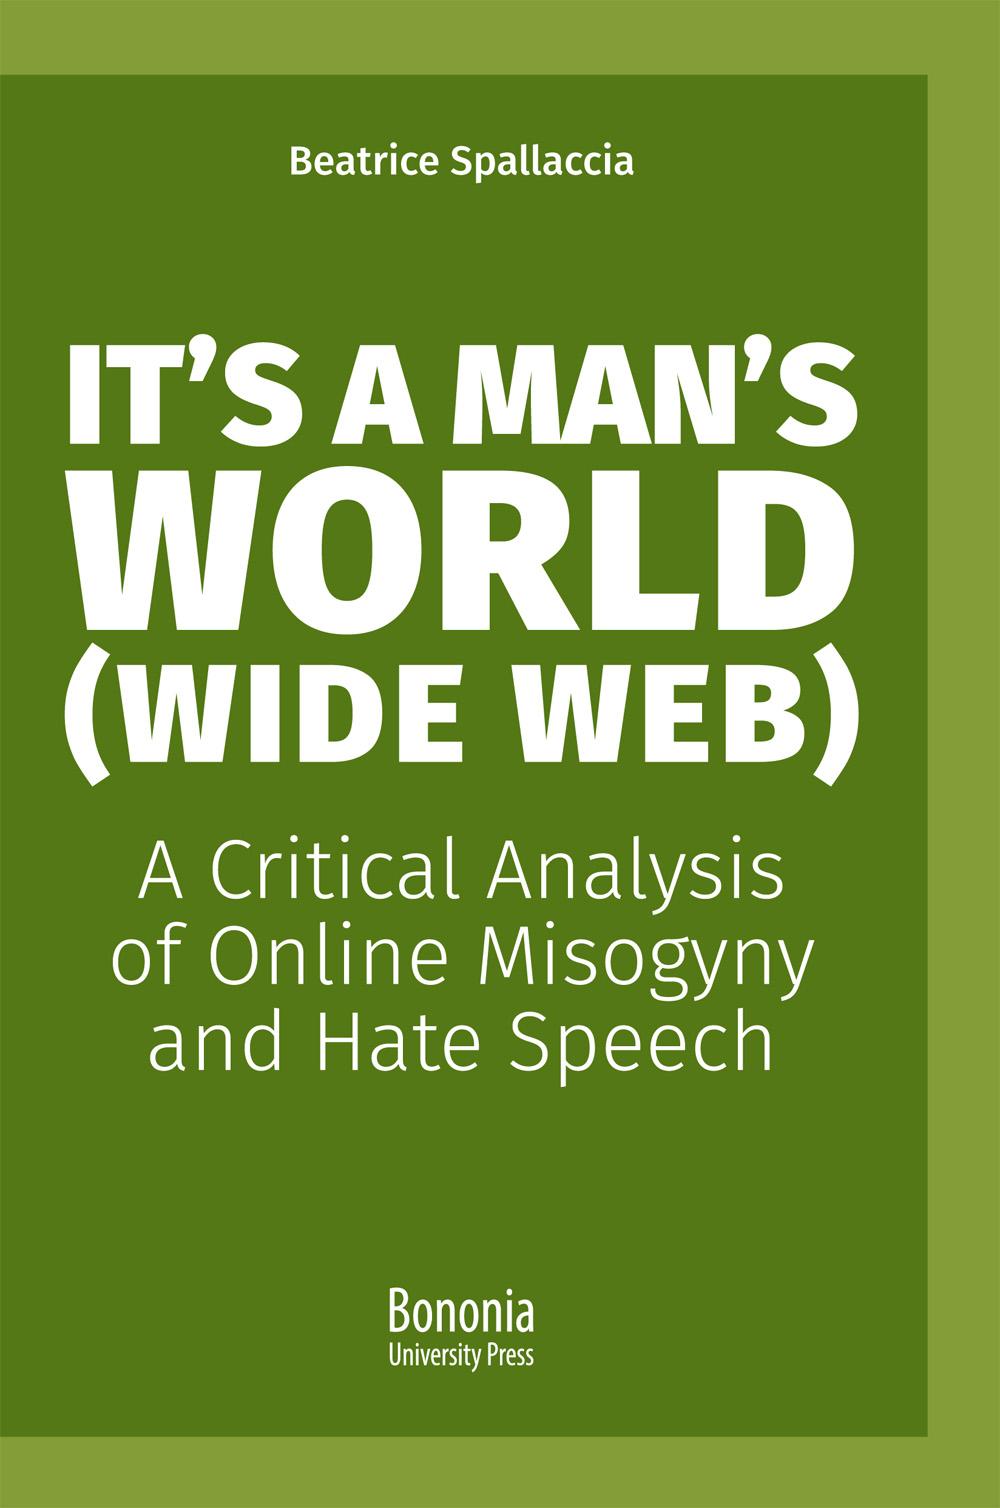 It's a Man's World (Wide Web) - Bononia University Press